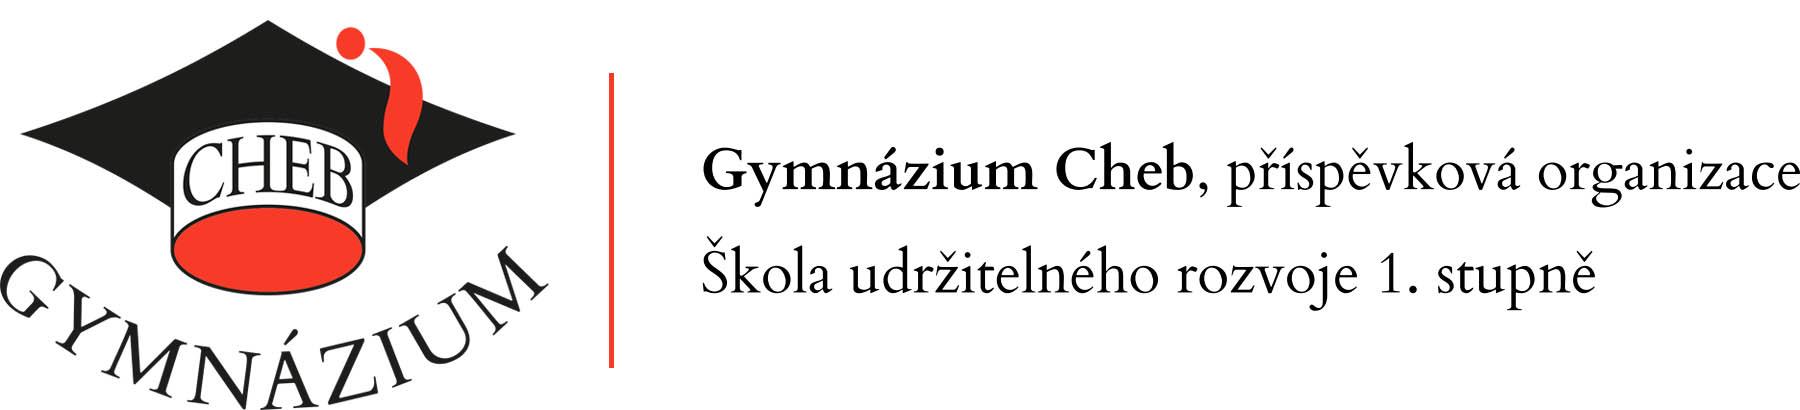 logo Gymnázium Cheb